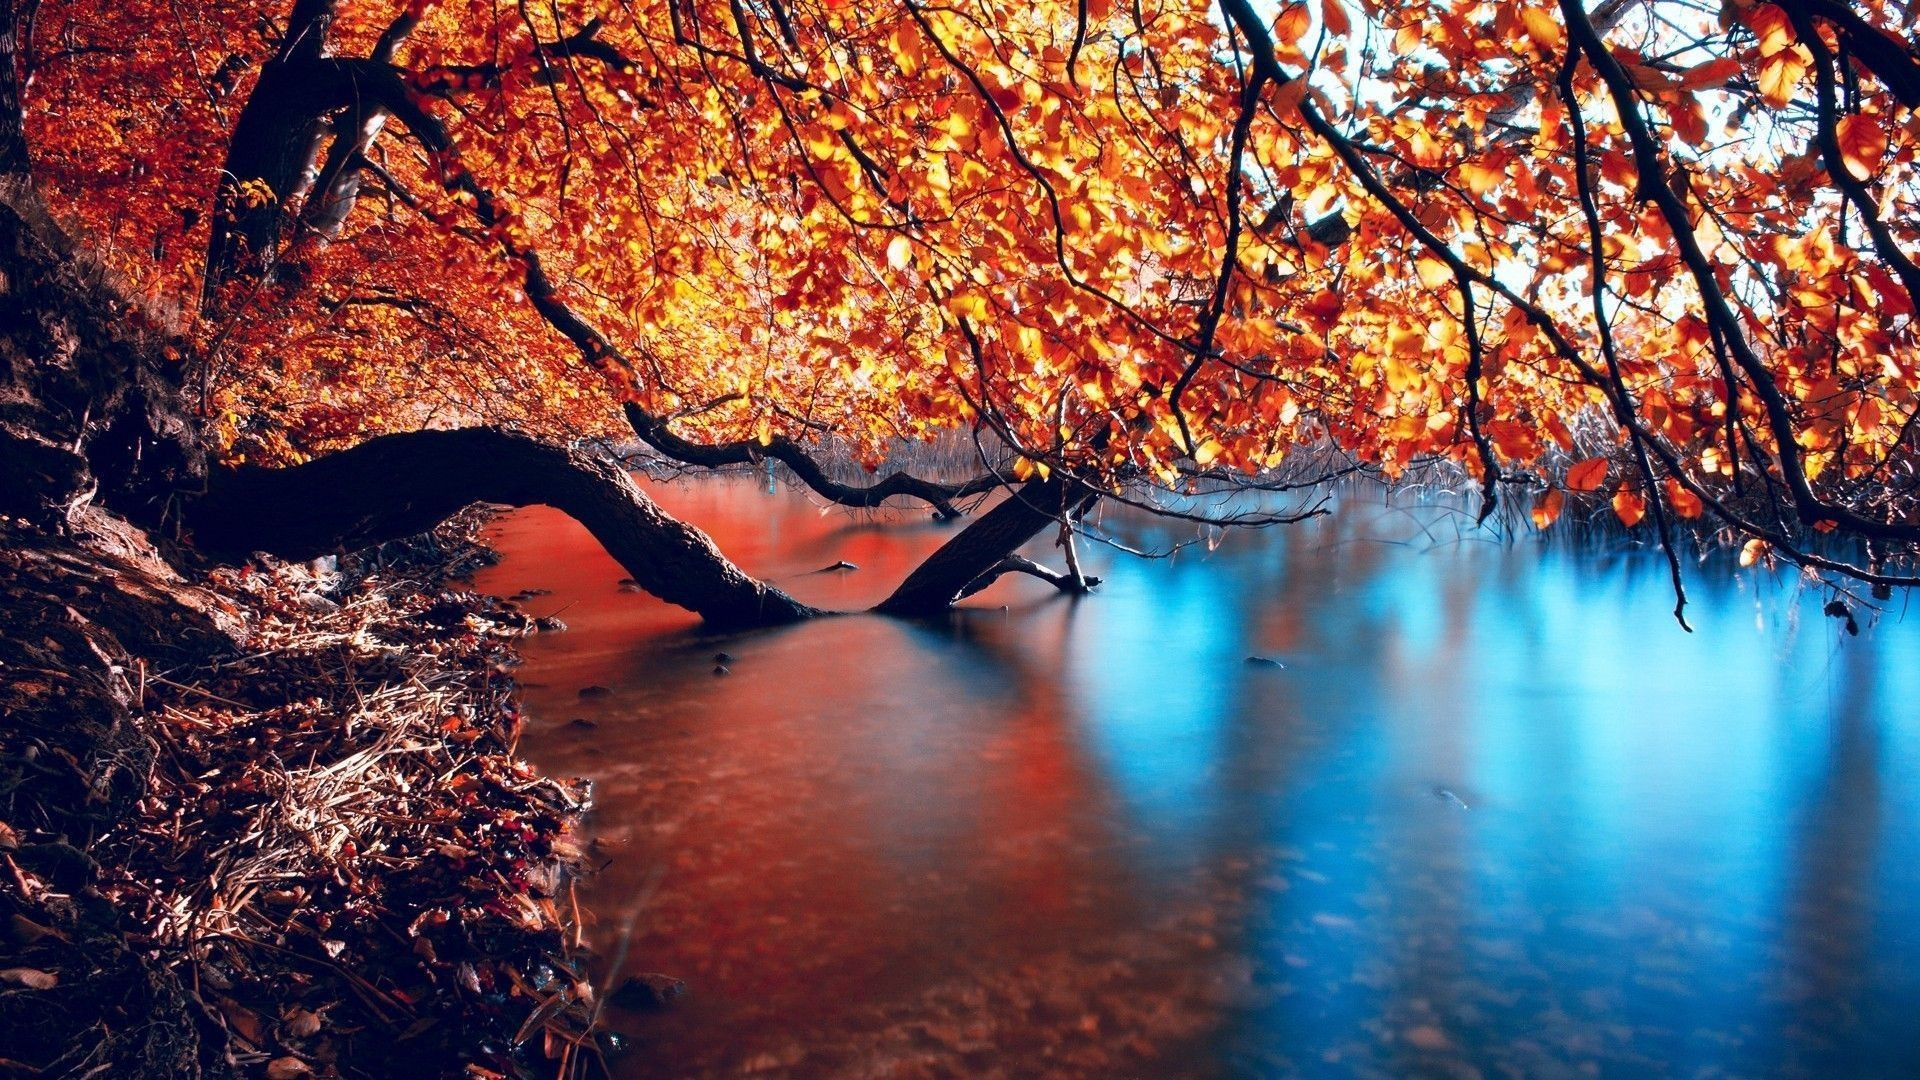 Fall wallpaper HD Download free wallpapers for desktop mobile